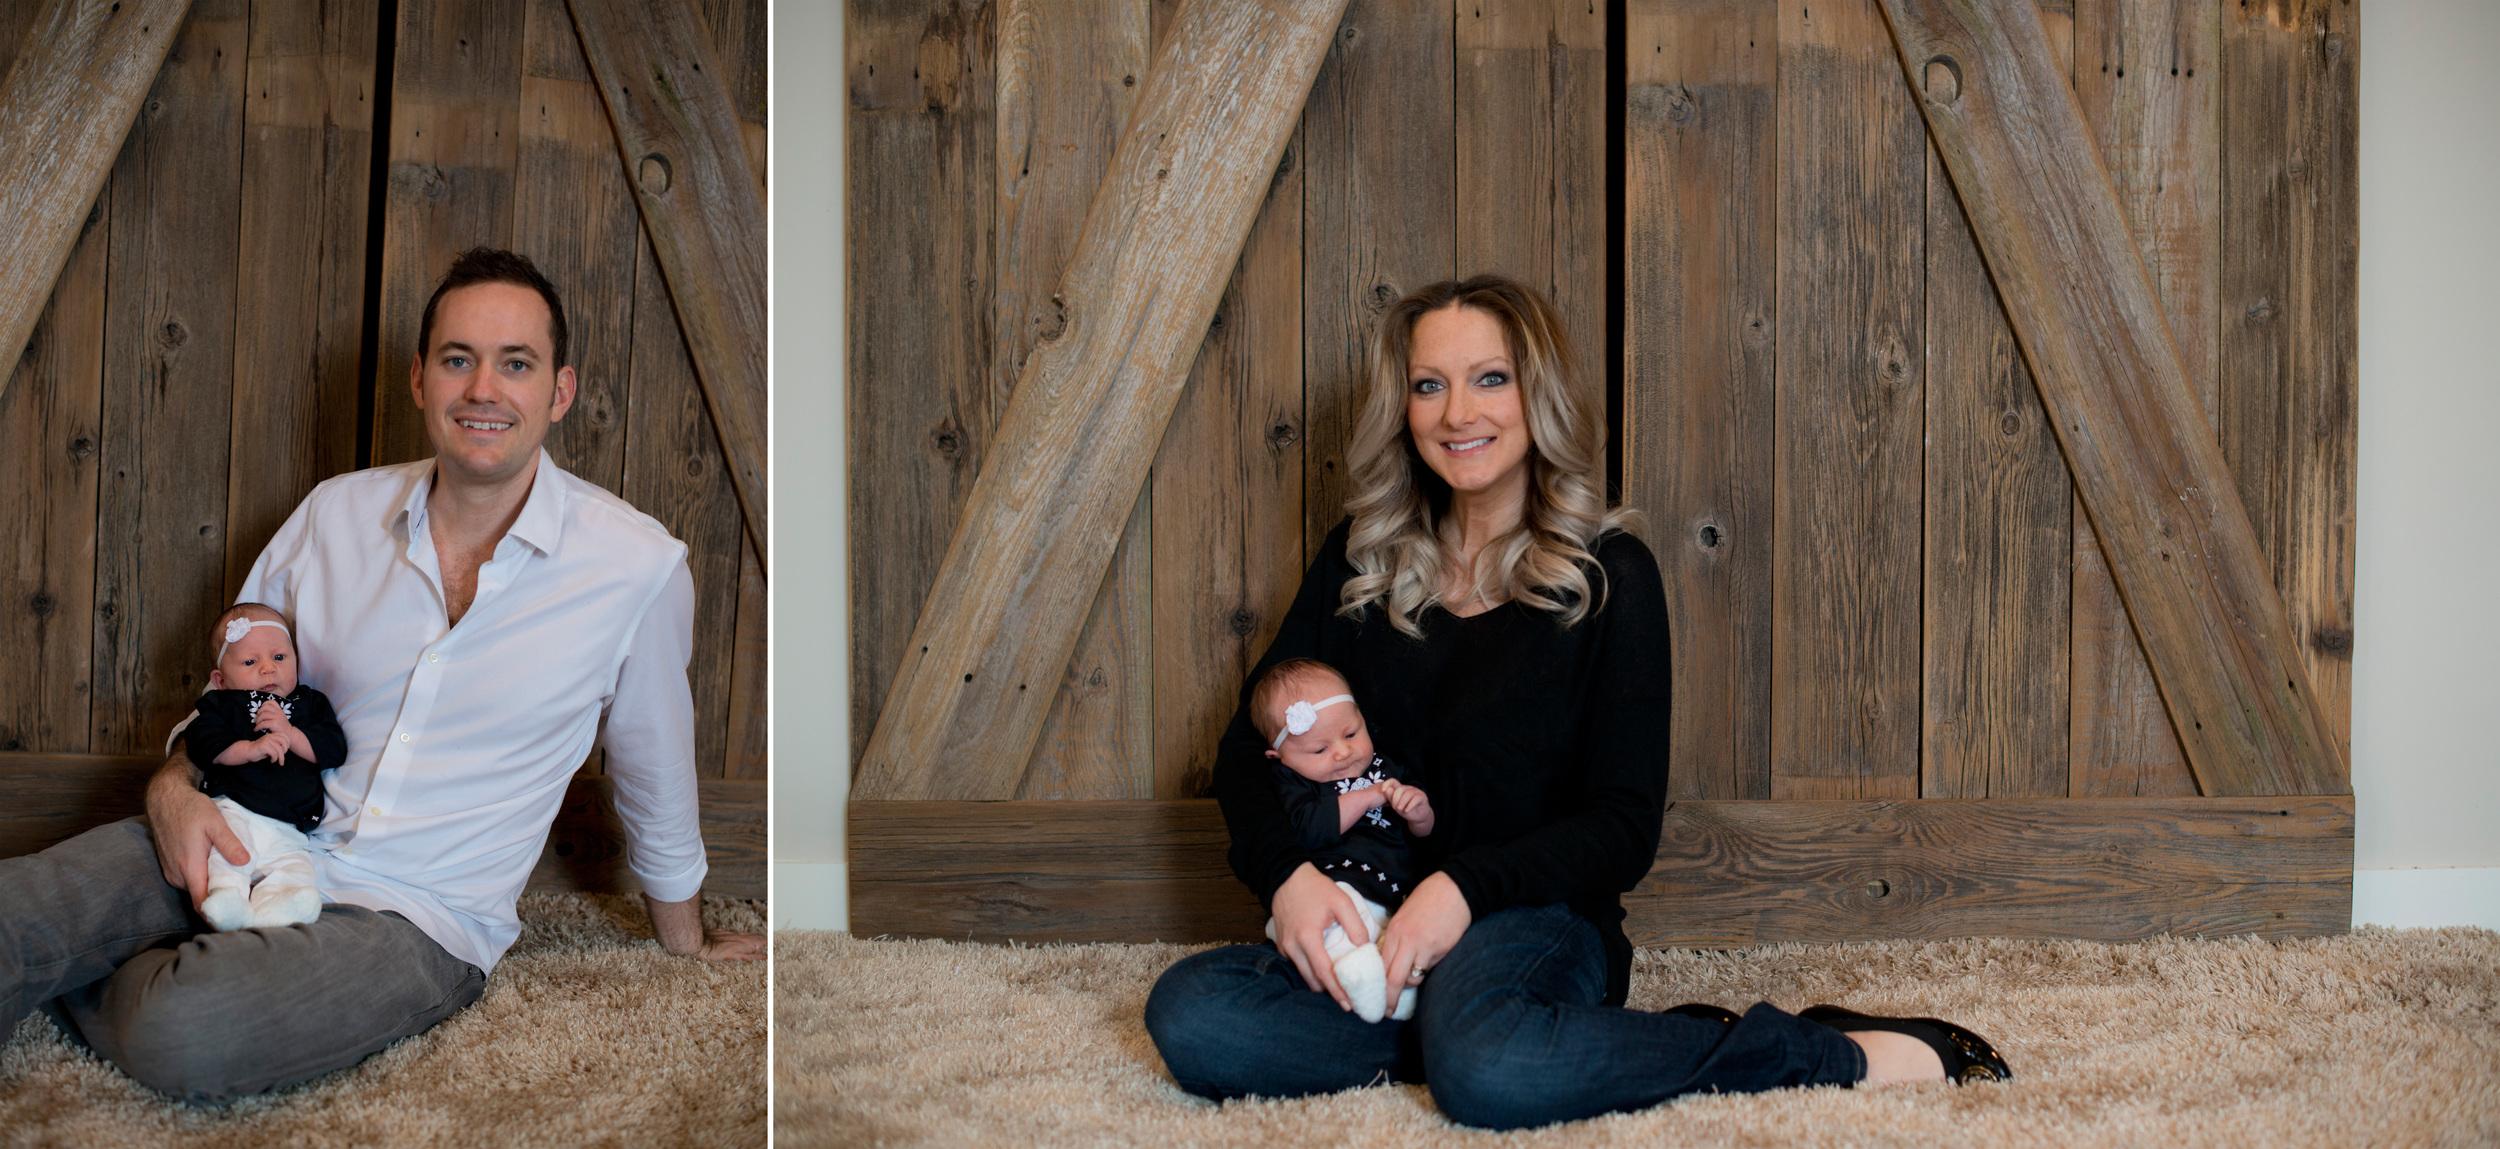 Dopps Family Series - JWild Photography (3).jpg